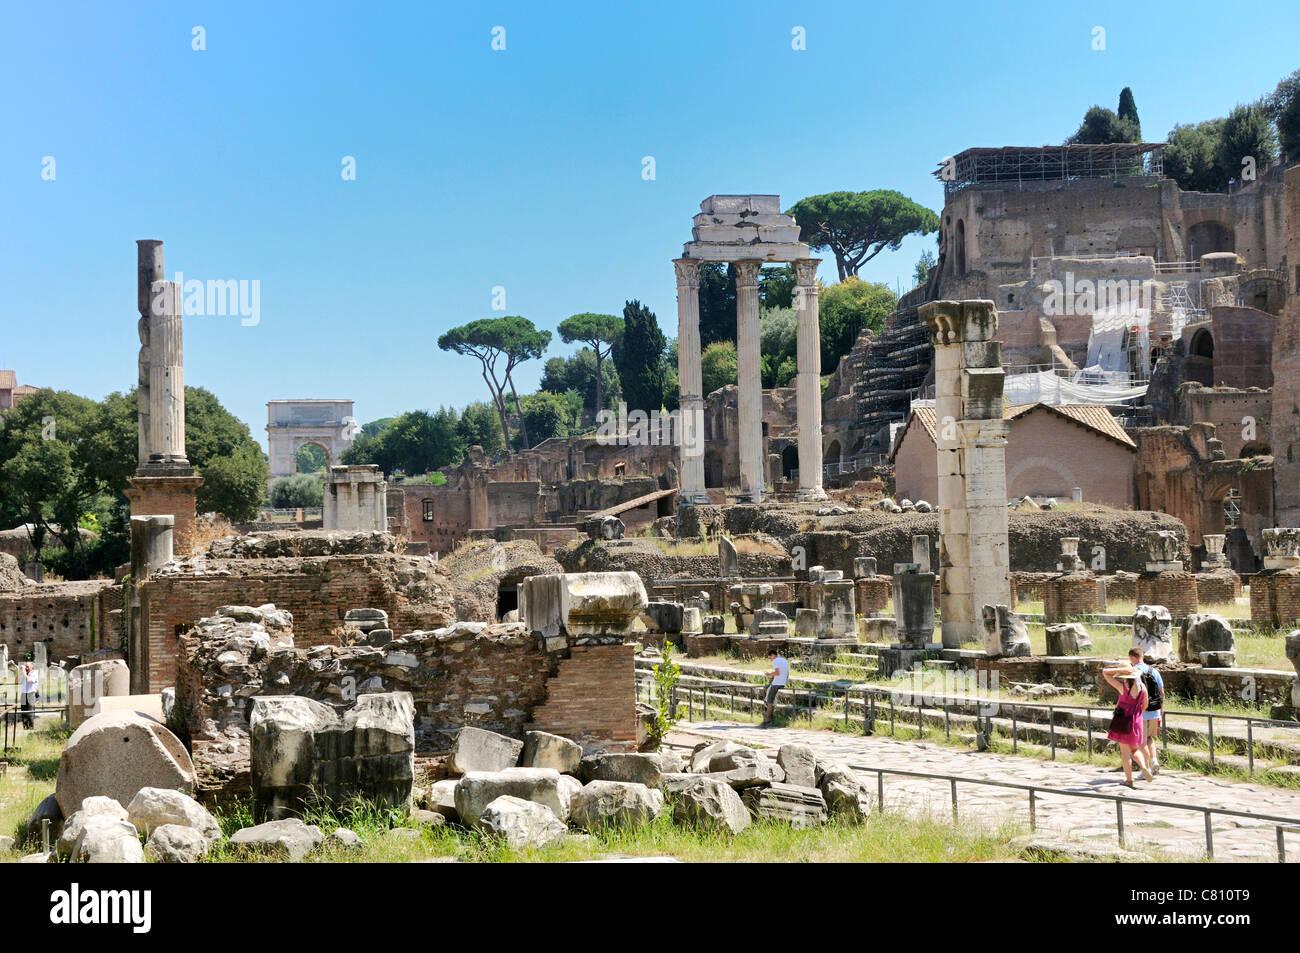 Ancient Rome : Via Sacra, Roman Forum, Rome, Italy, Europe - Stock Image